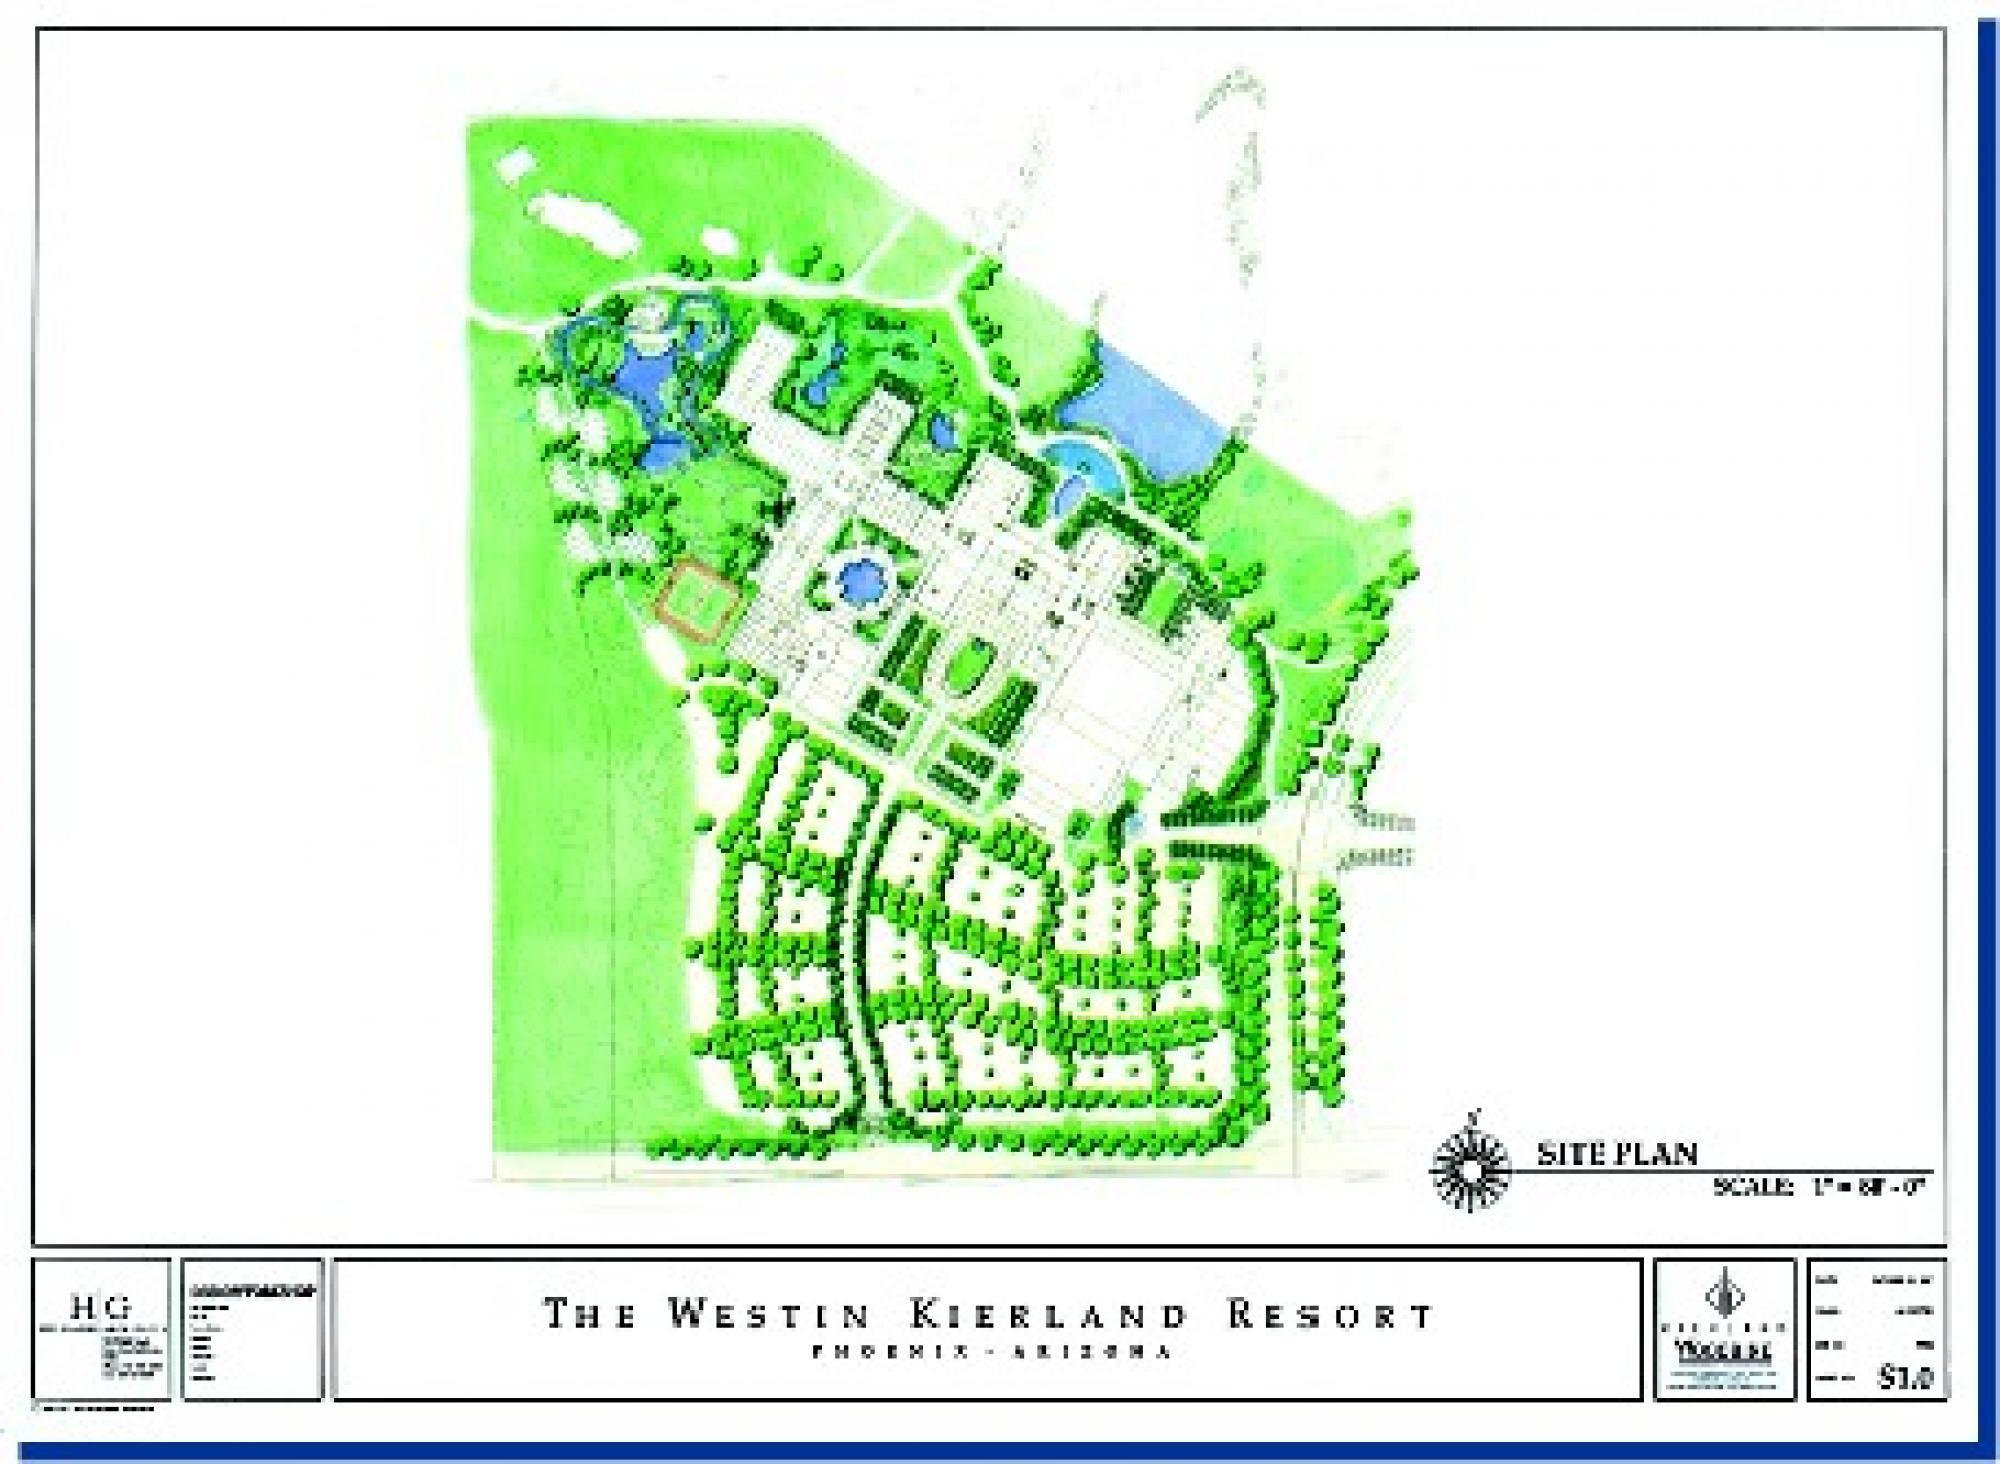 Westin Kierland Resort Site Plan